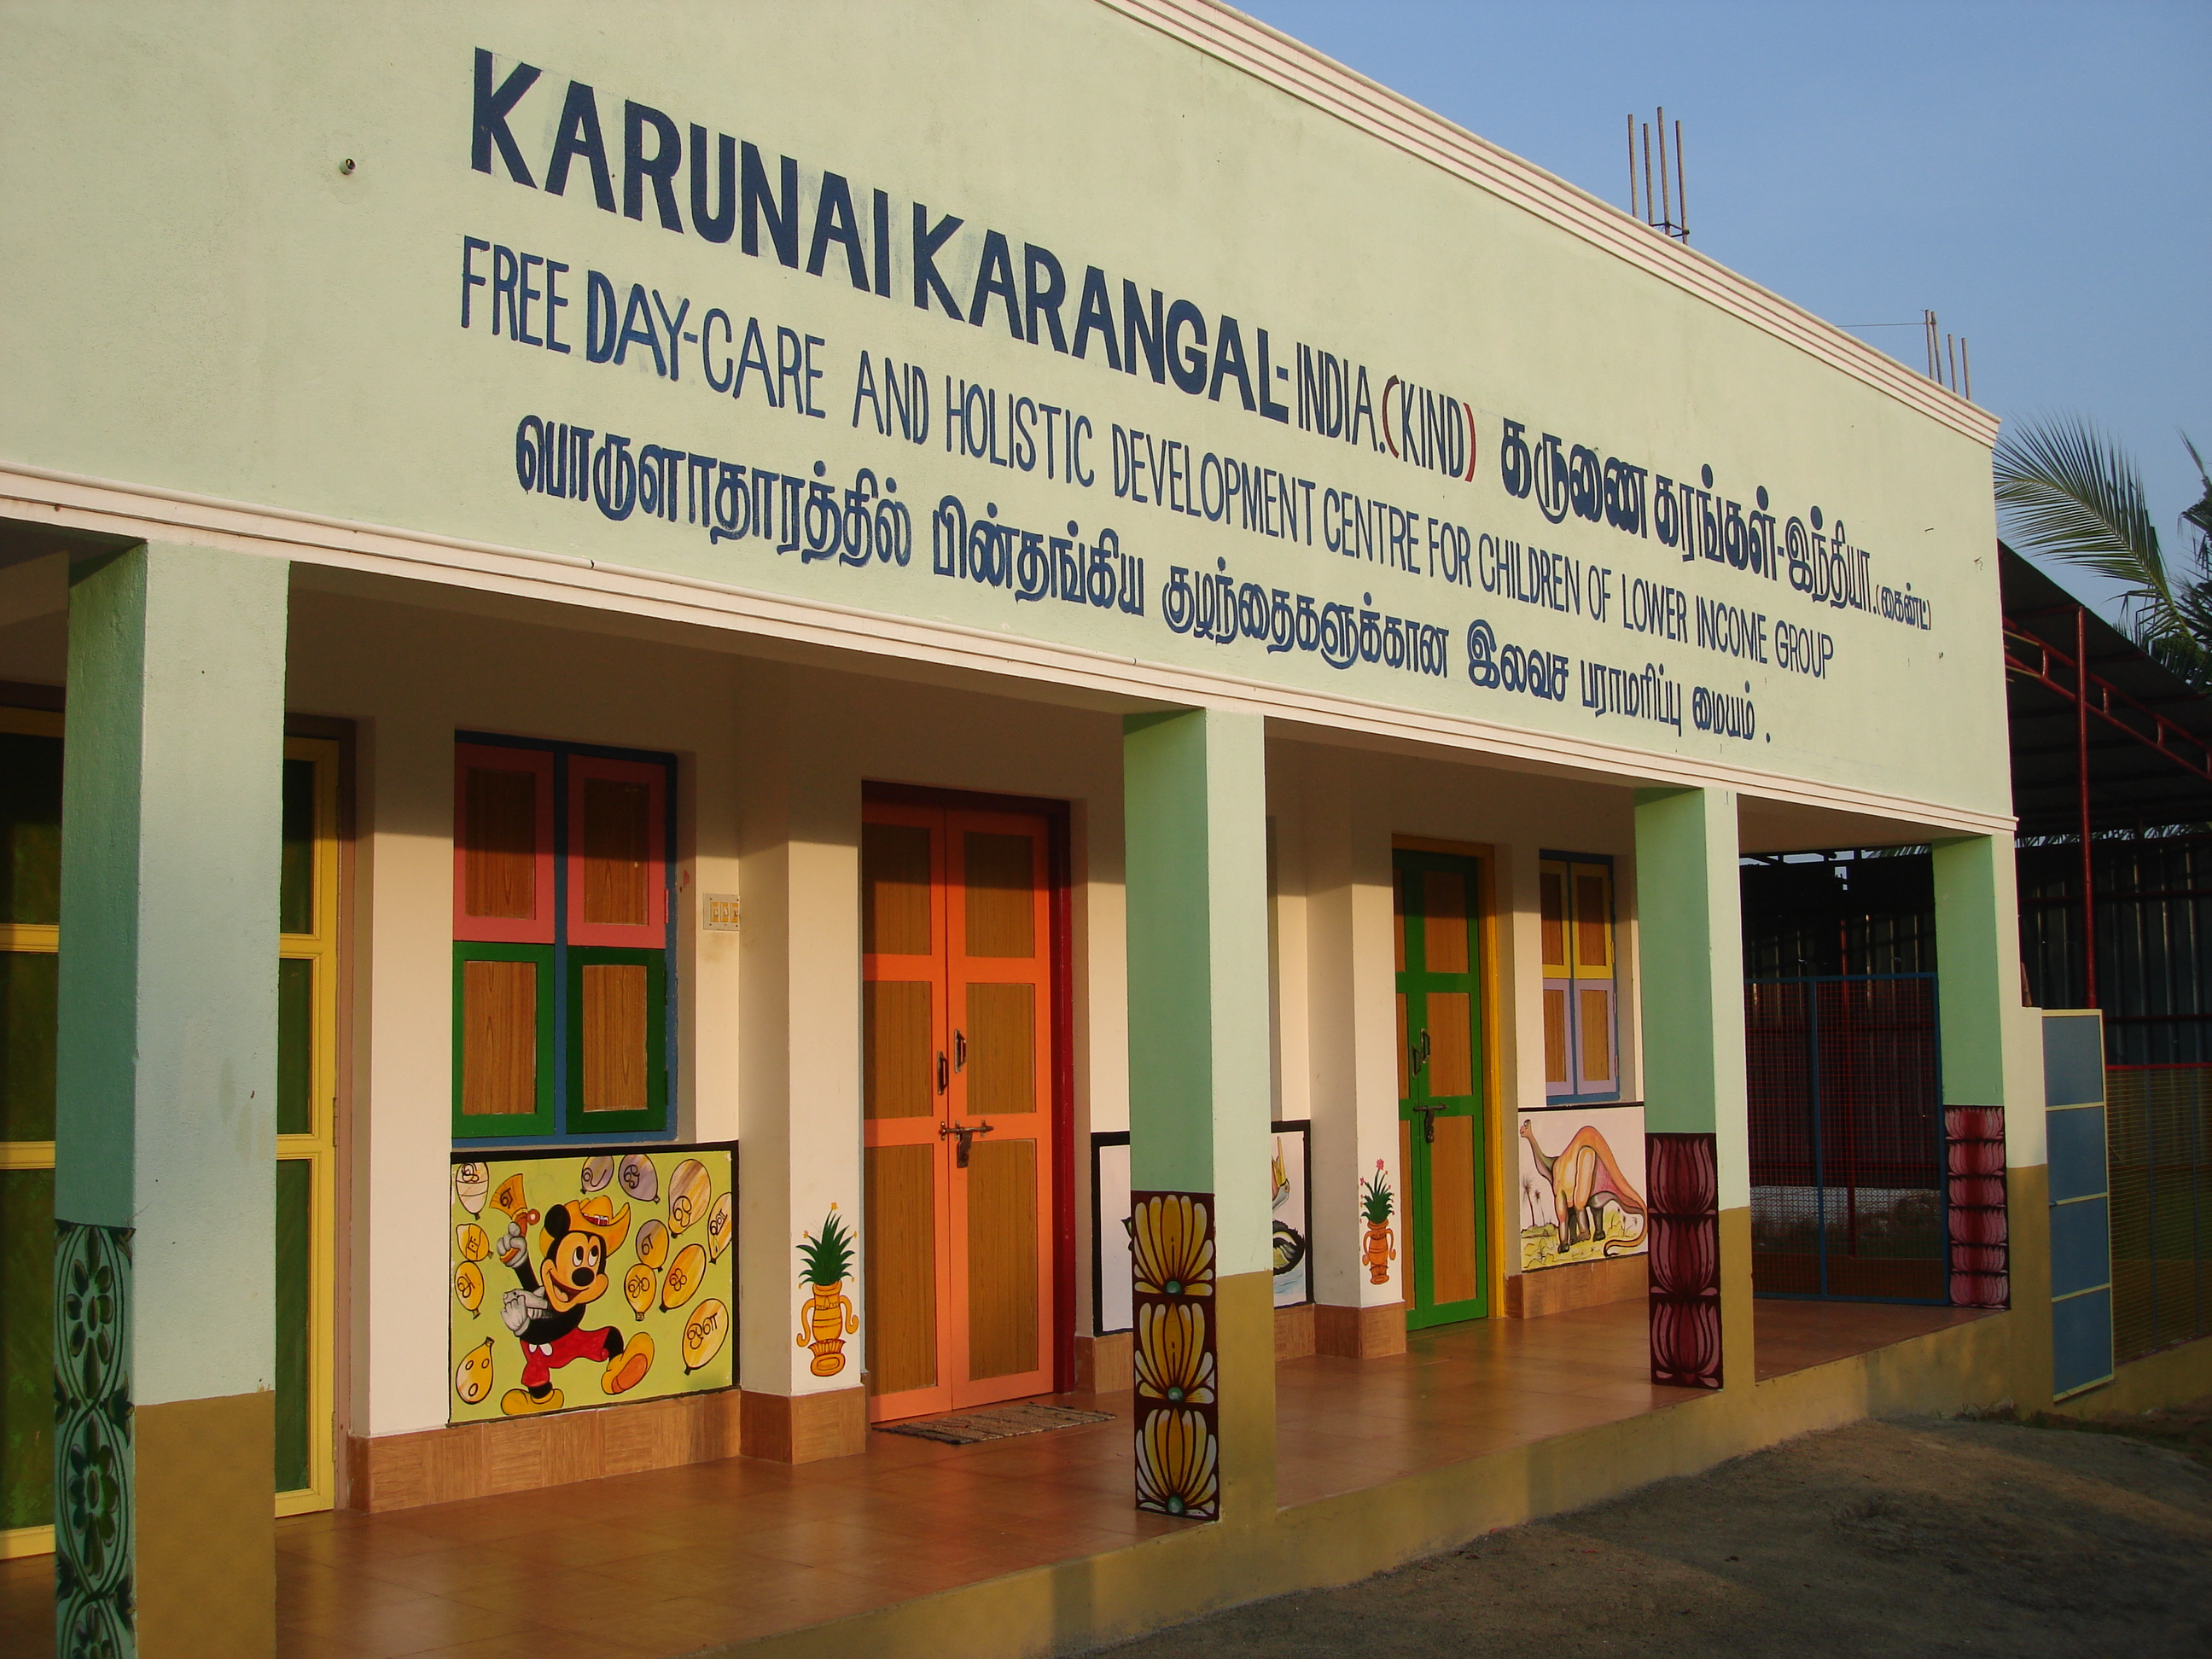 Der Kinderhort in Karunai in Indien